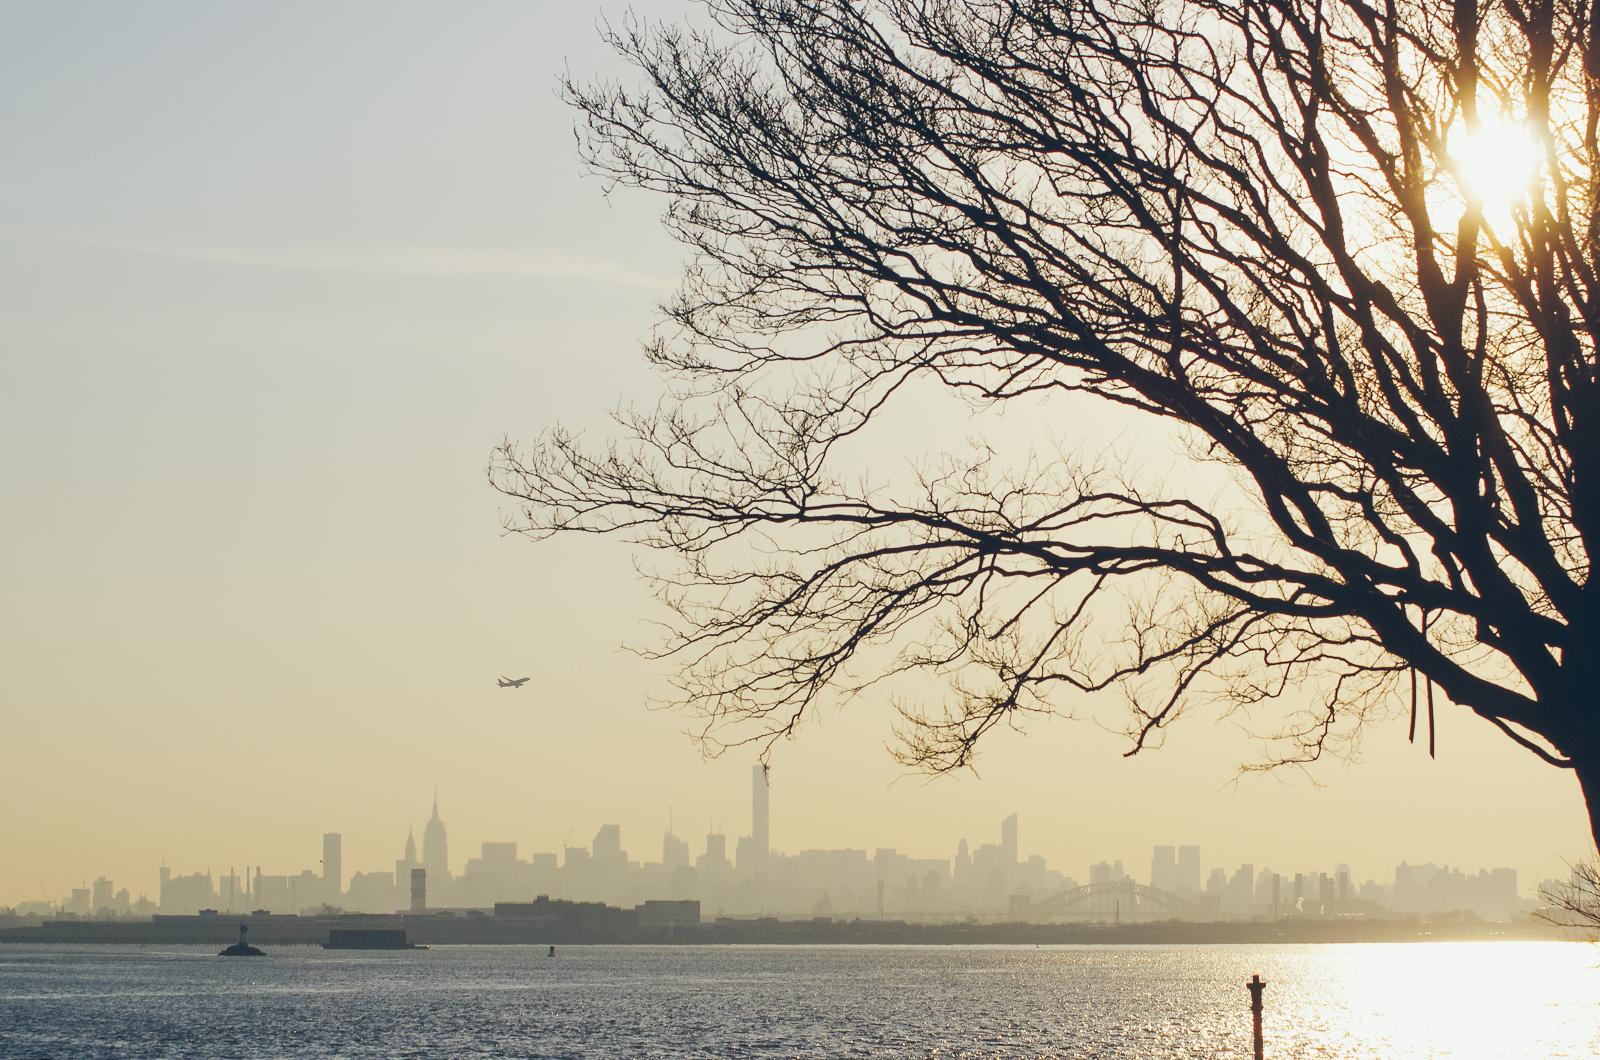 Skyline of Manhattan seen from the Ferry Point Park